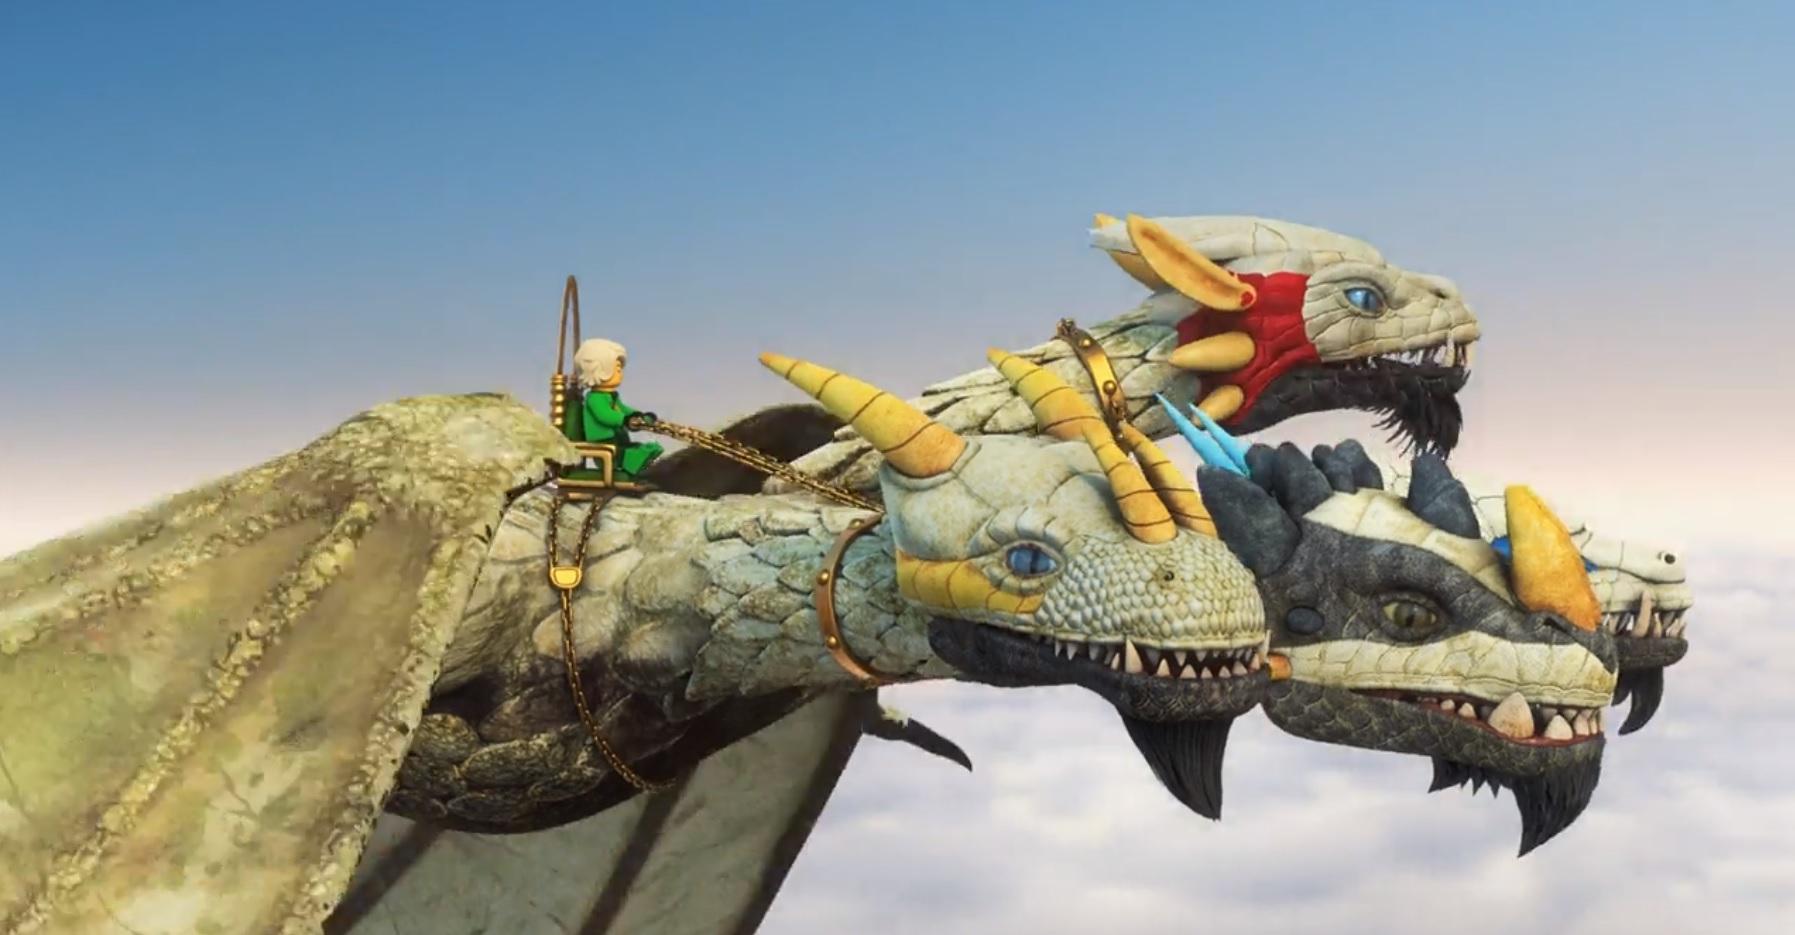 Lego Ninjago Ultra Dragon Show Olivero